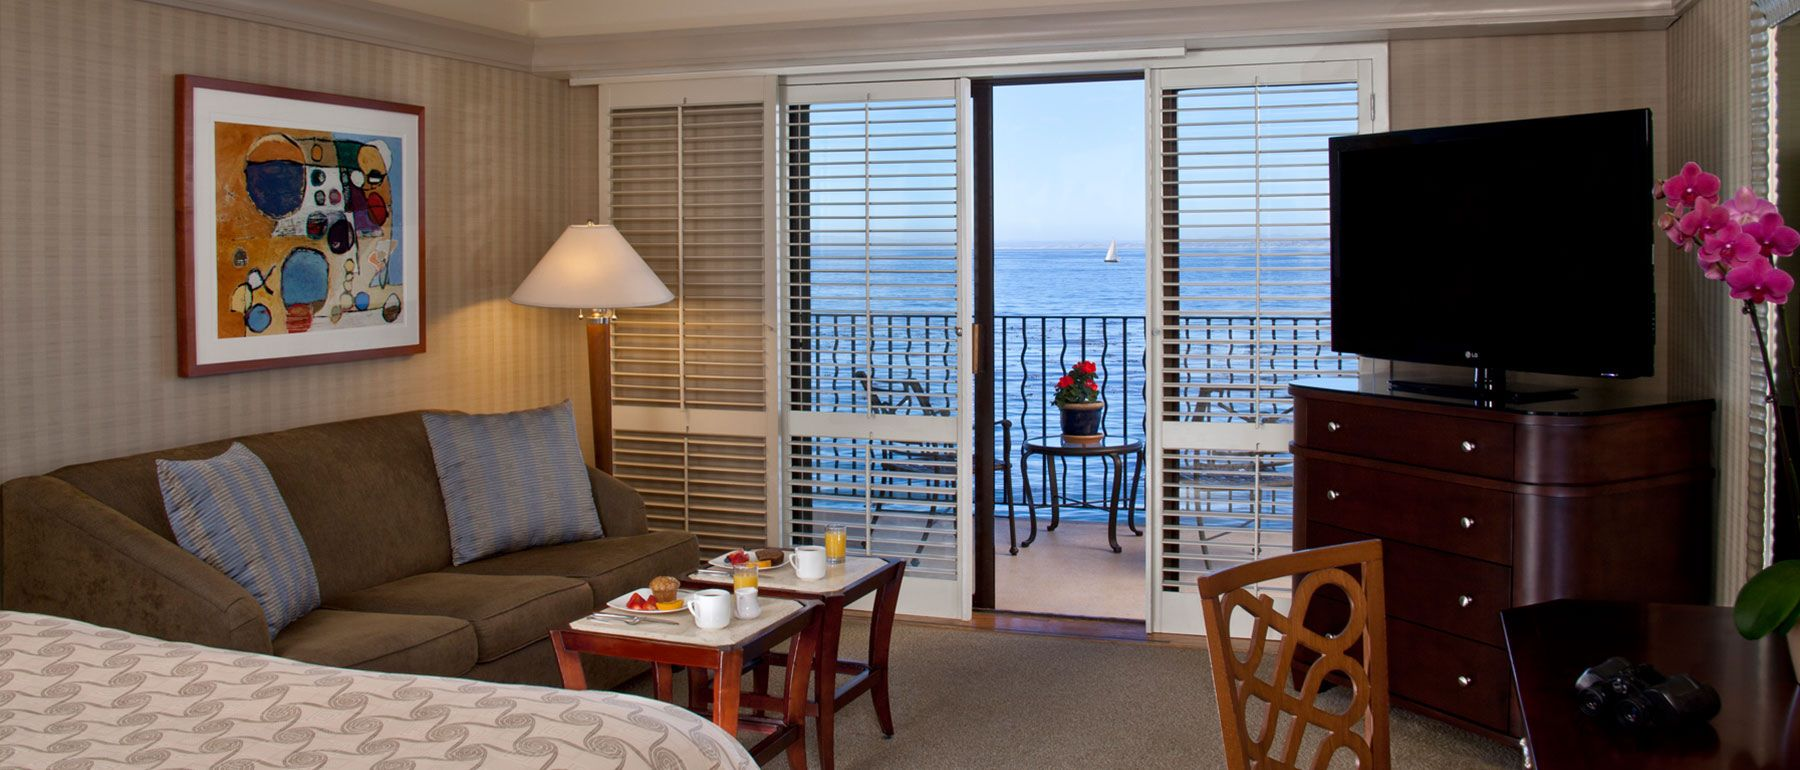 Oceanfront Room in Monterey Bay Inn Hotel